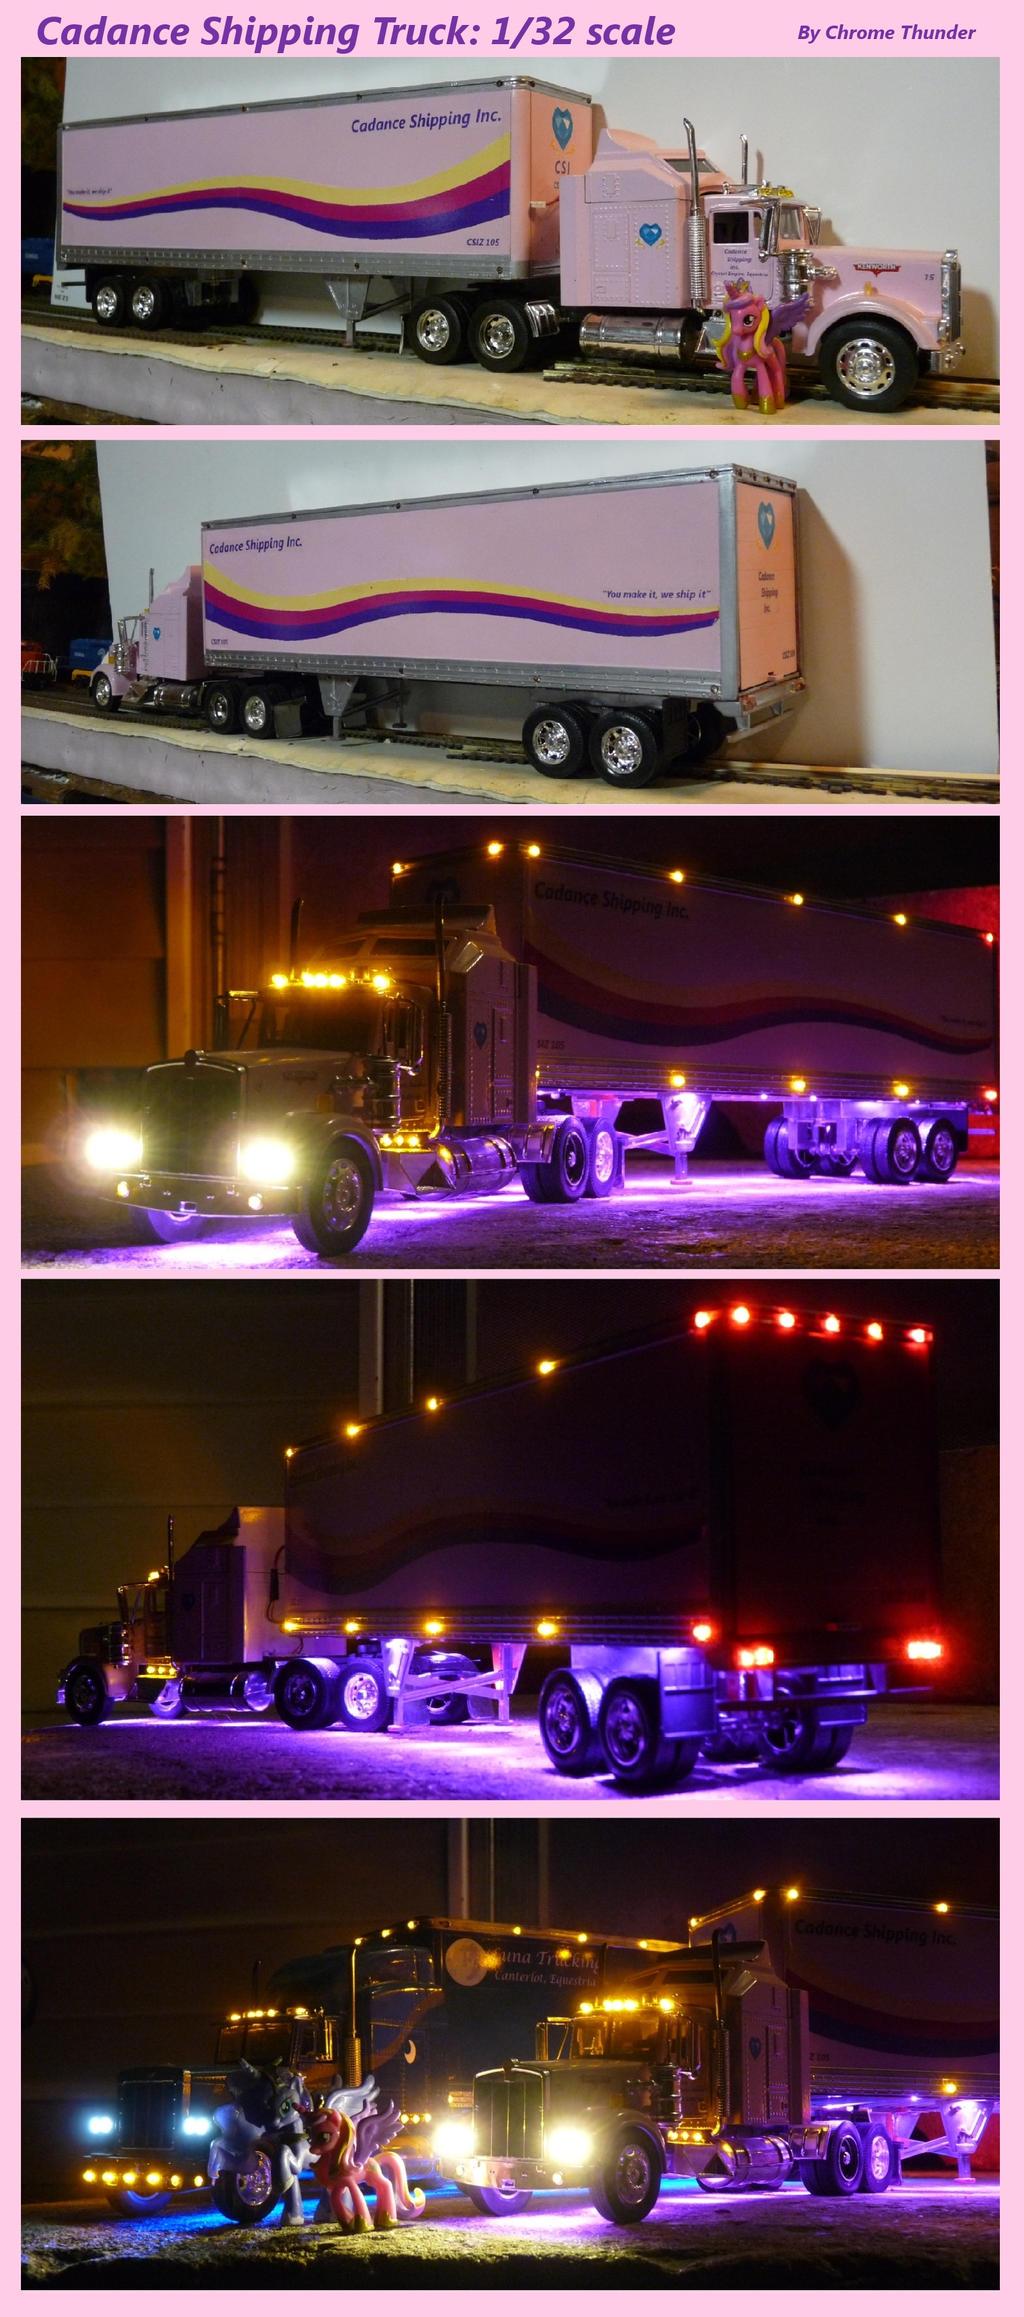 Cadance Trucking Semi Model: 1/32 Scale